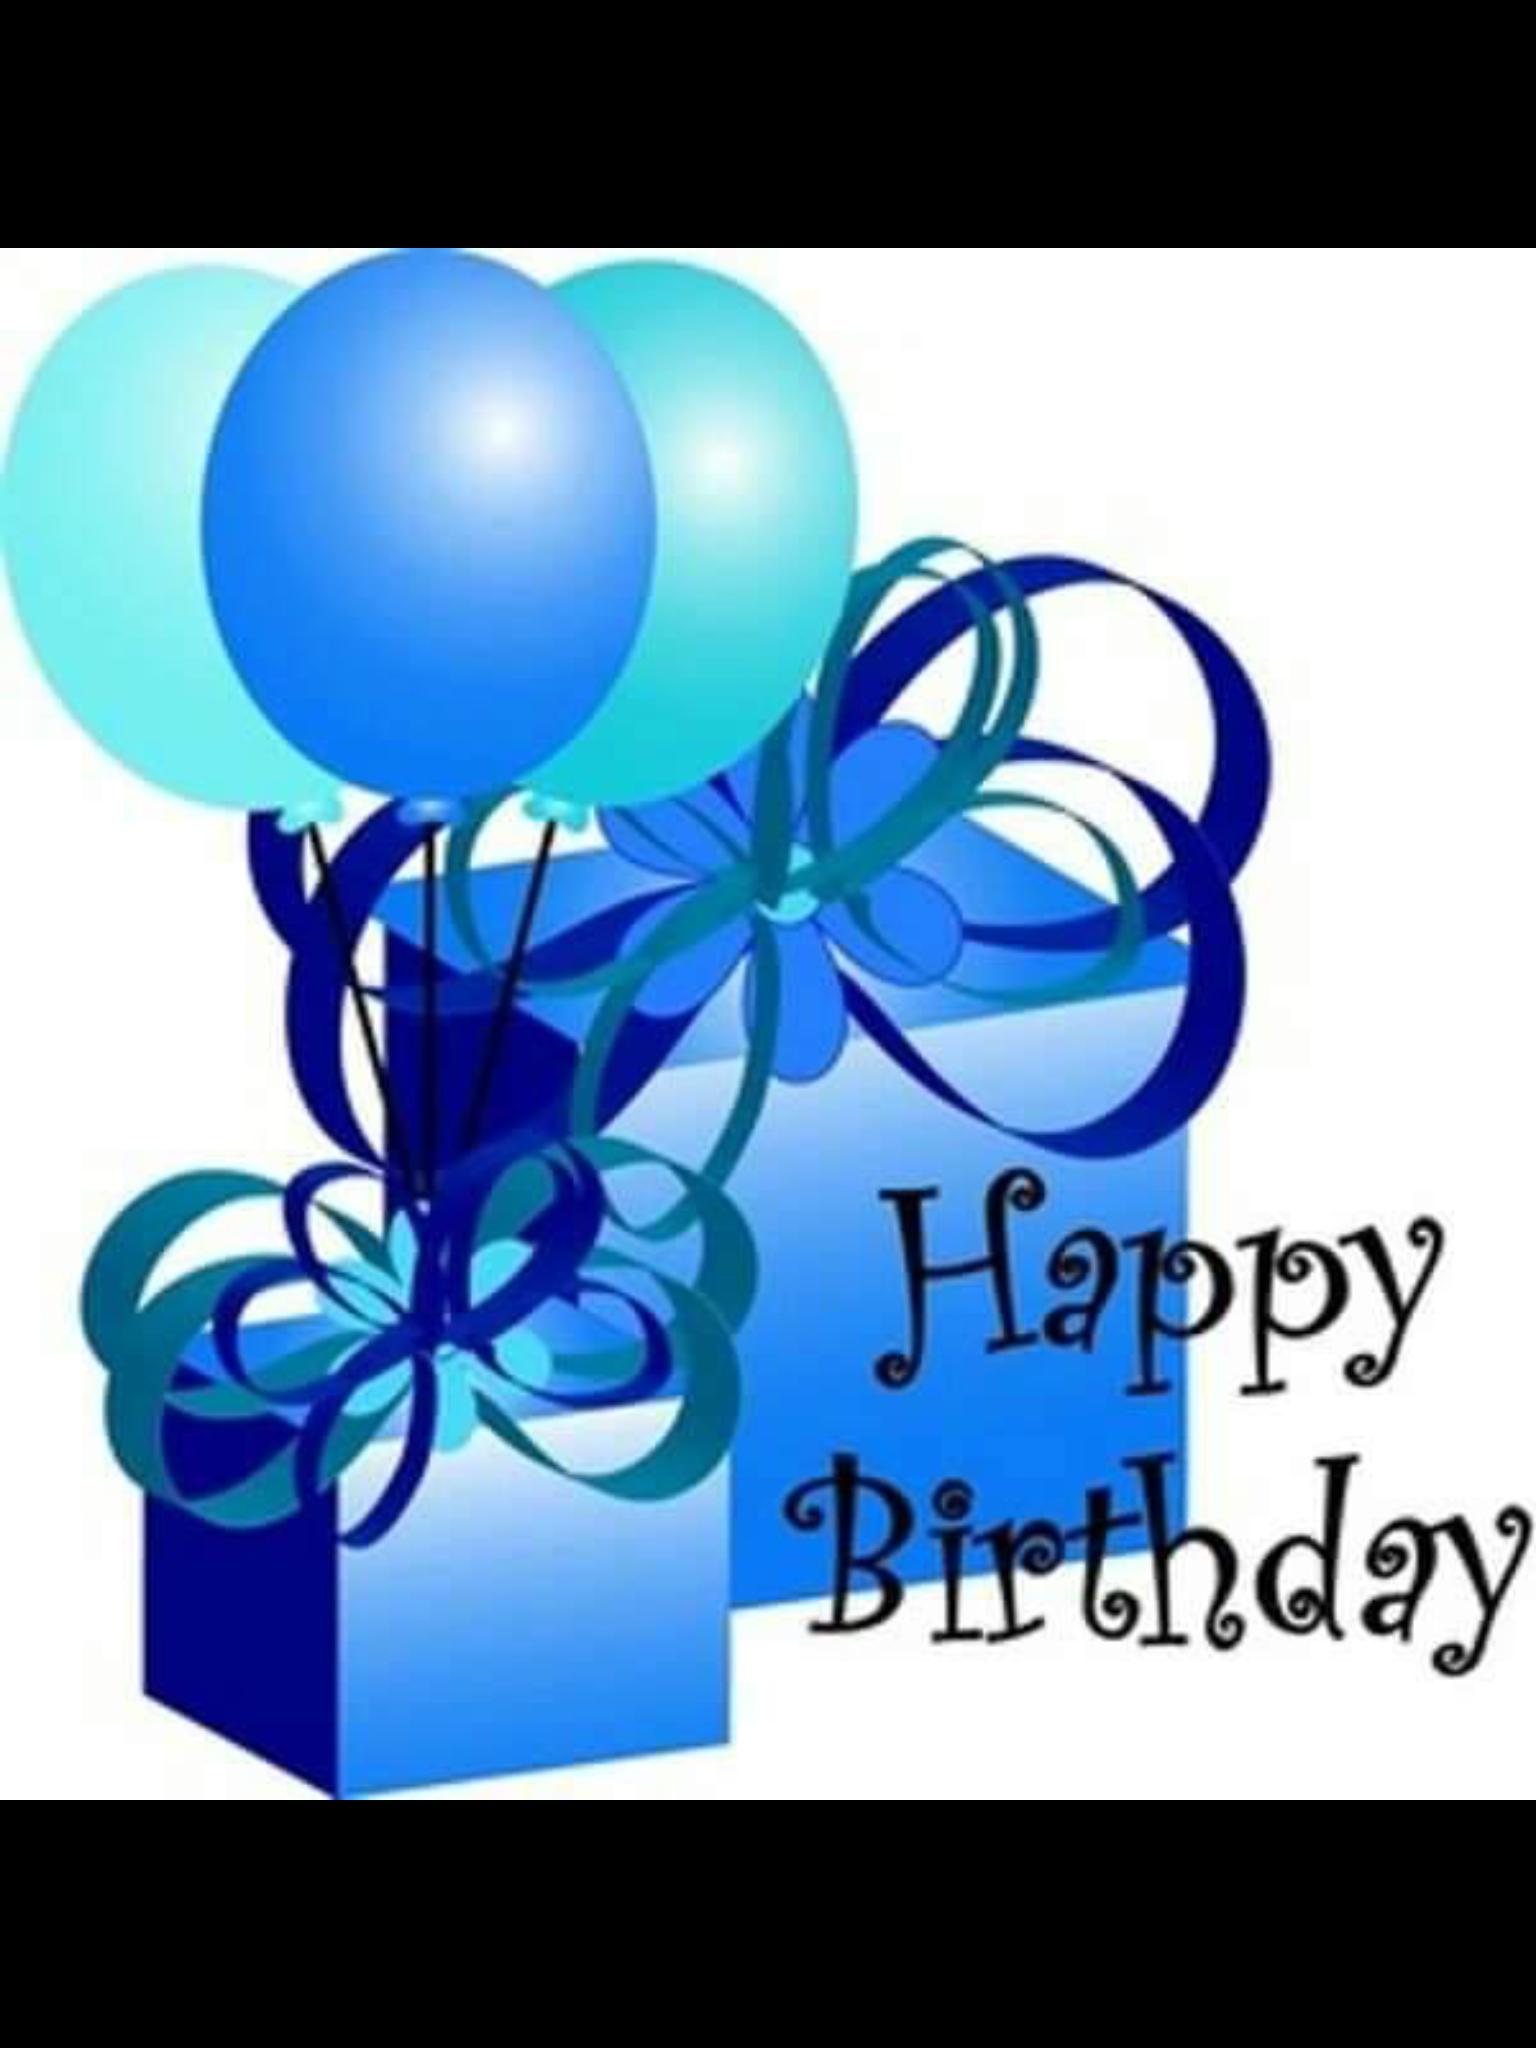 Pin By Angel Unissa On Just B Day Board Happy Birthday